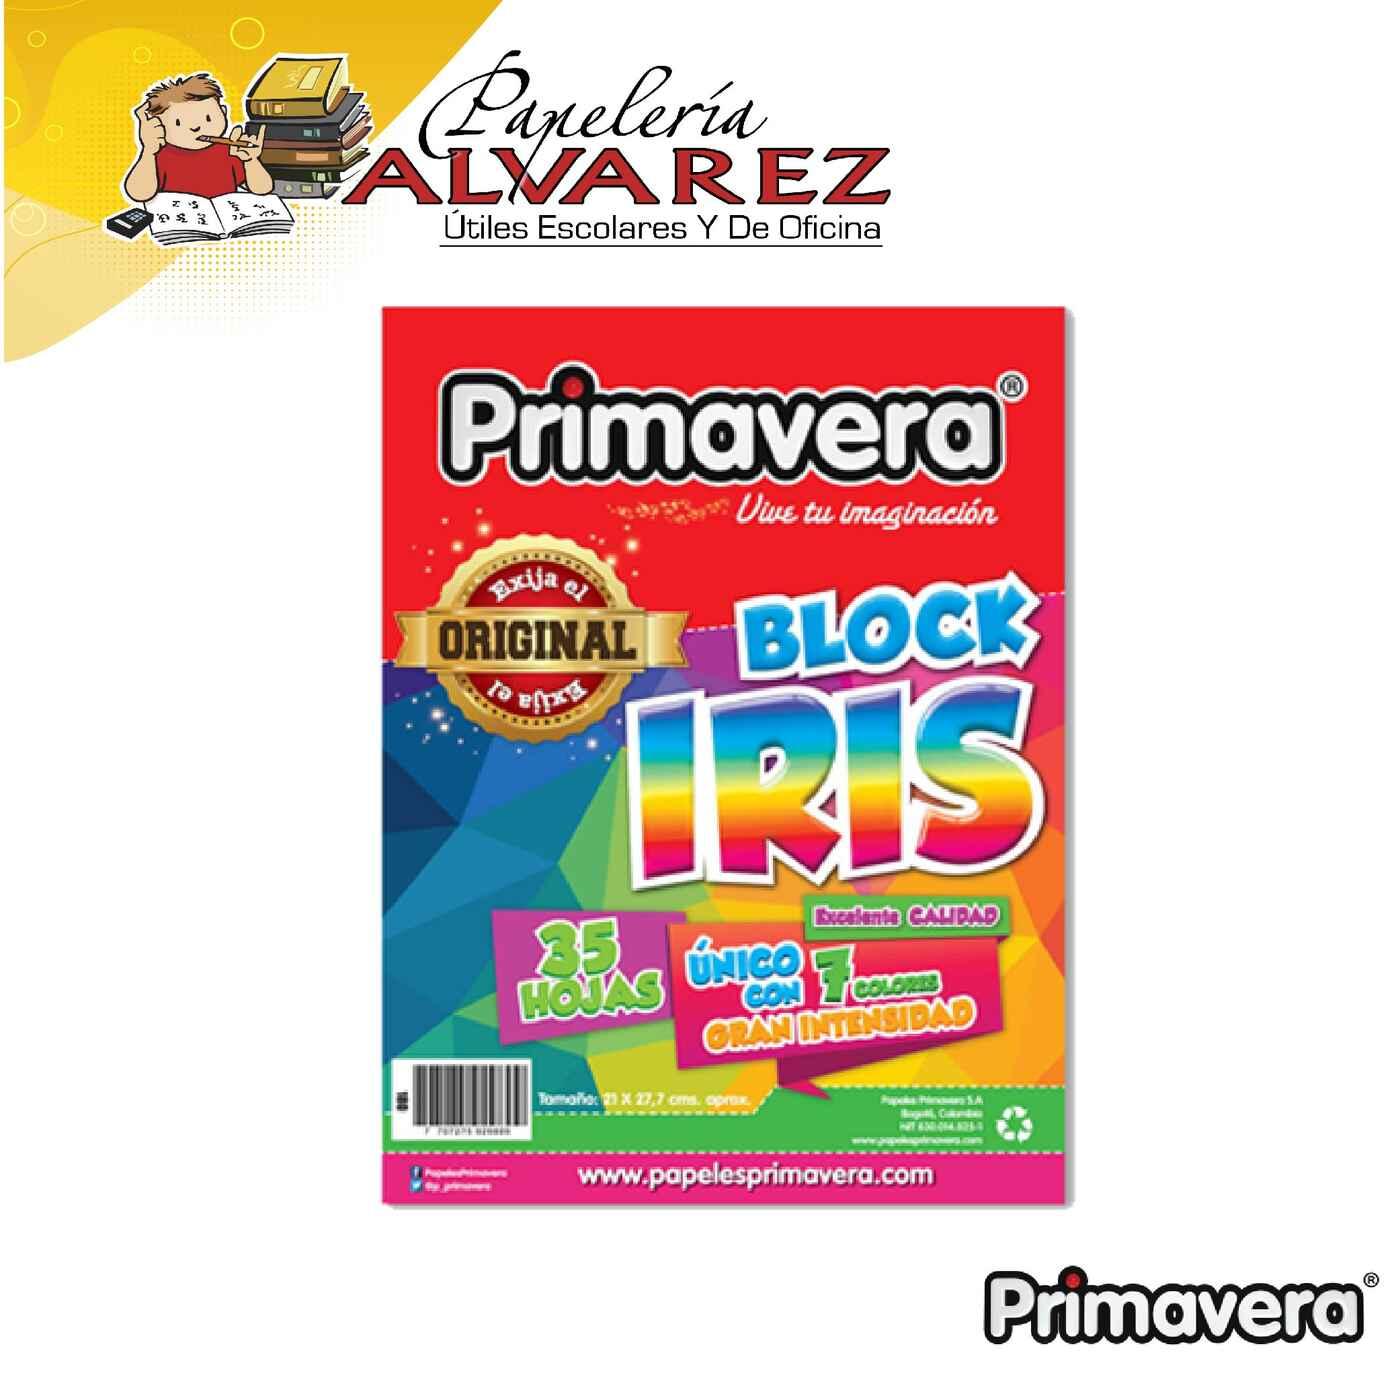 BLOCK IRIS CARTA PRIMAVERA 35 HOJAS